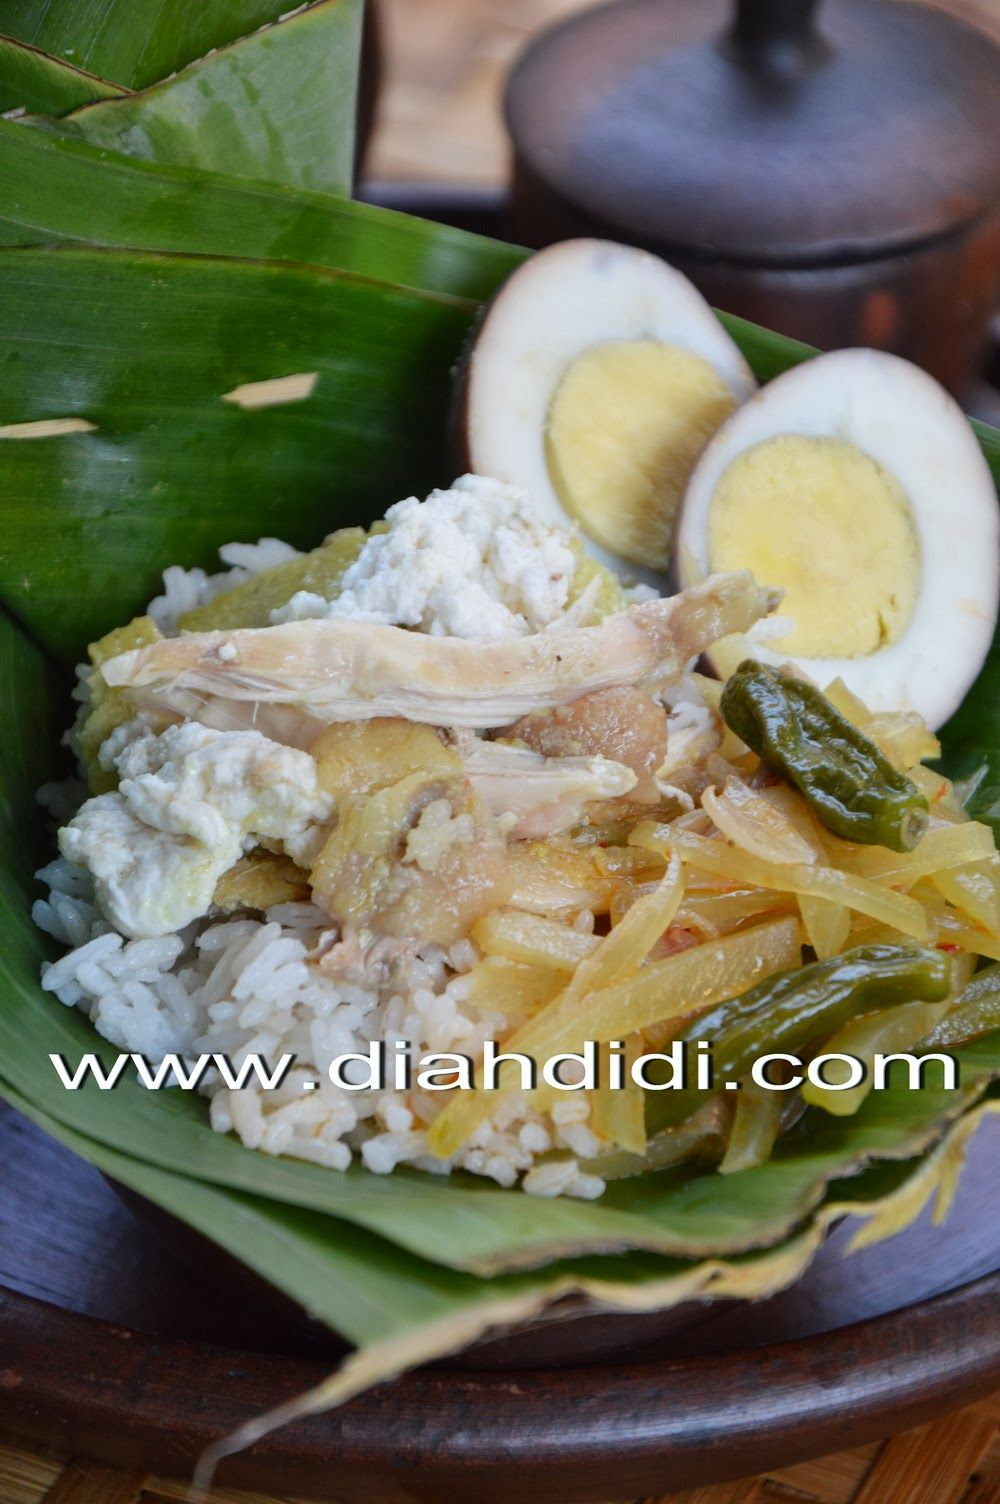 Resep Nasi Liwet Solo Komplit Resep Makan Malam Sehat Resep Masakan Resep Makanan Sehat